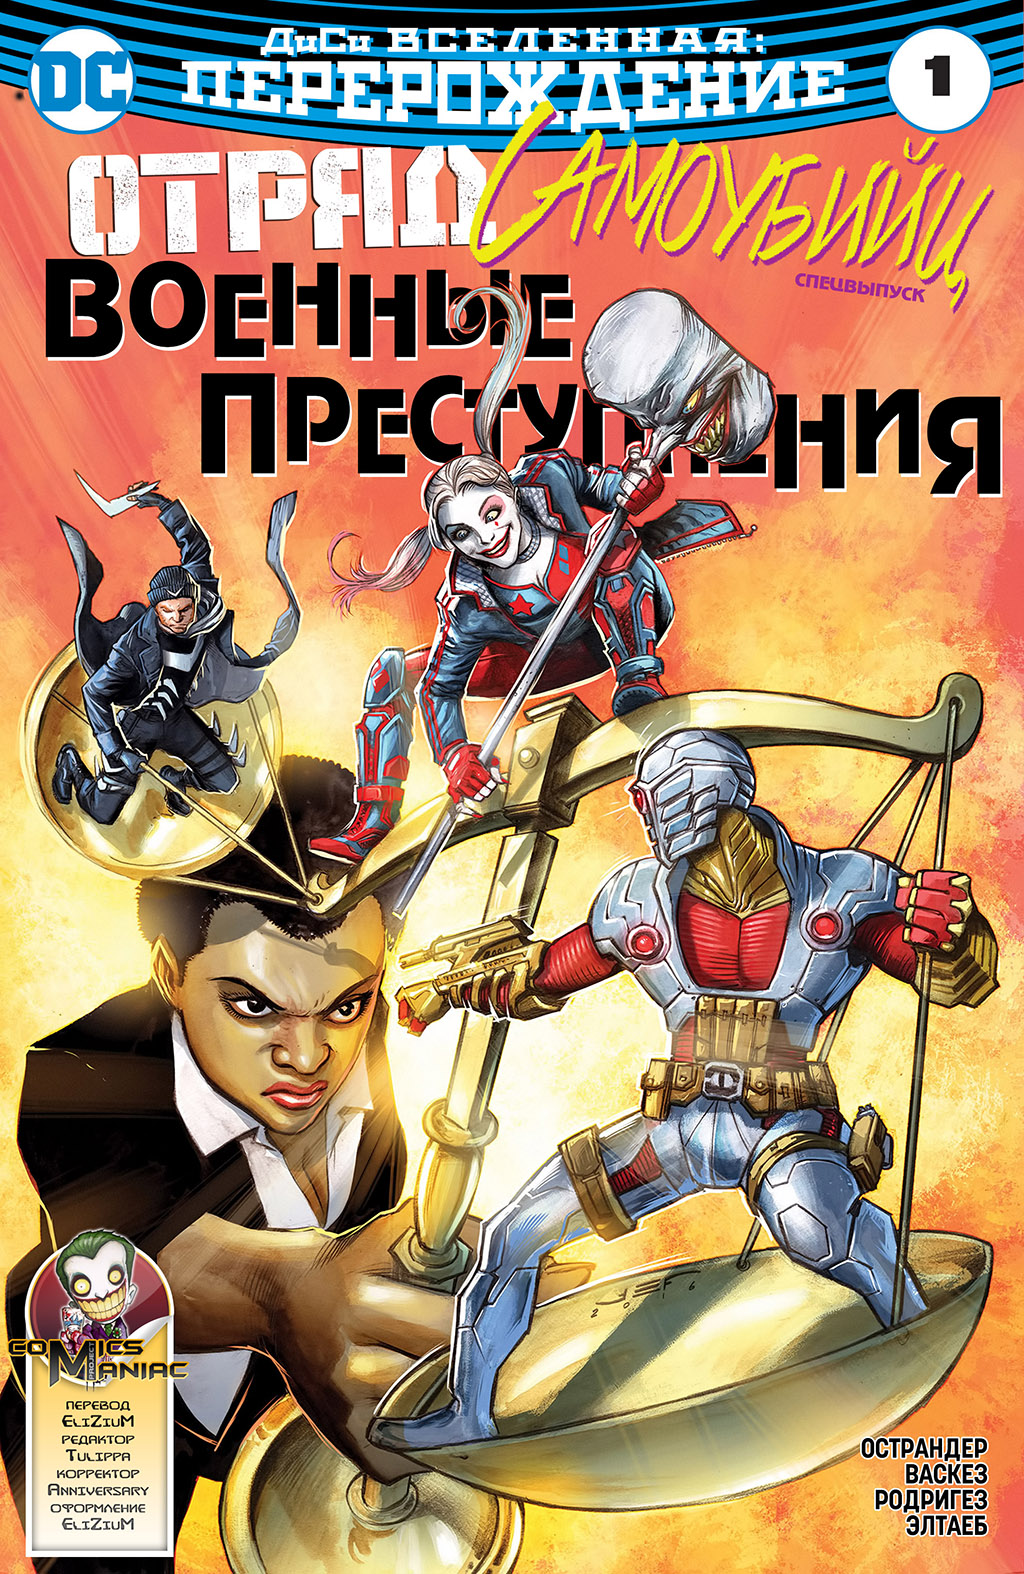 Комикс Боевые Комиксы